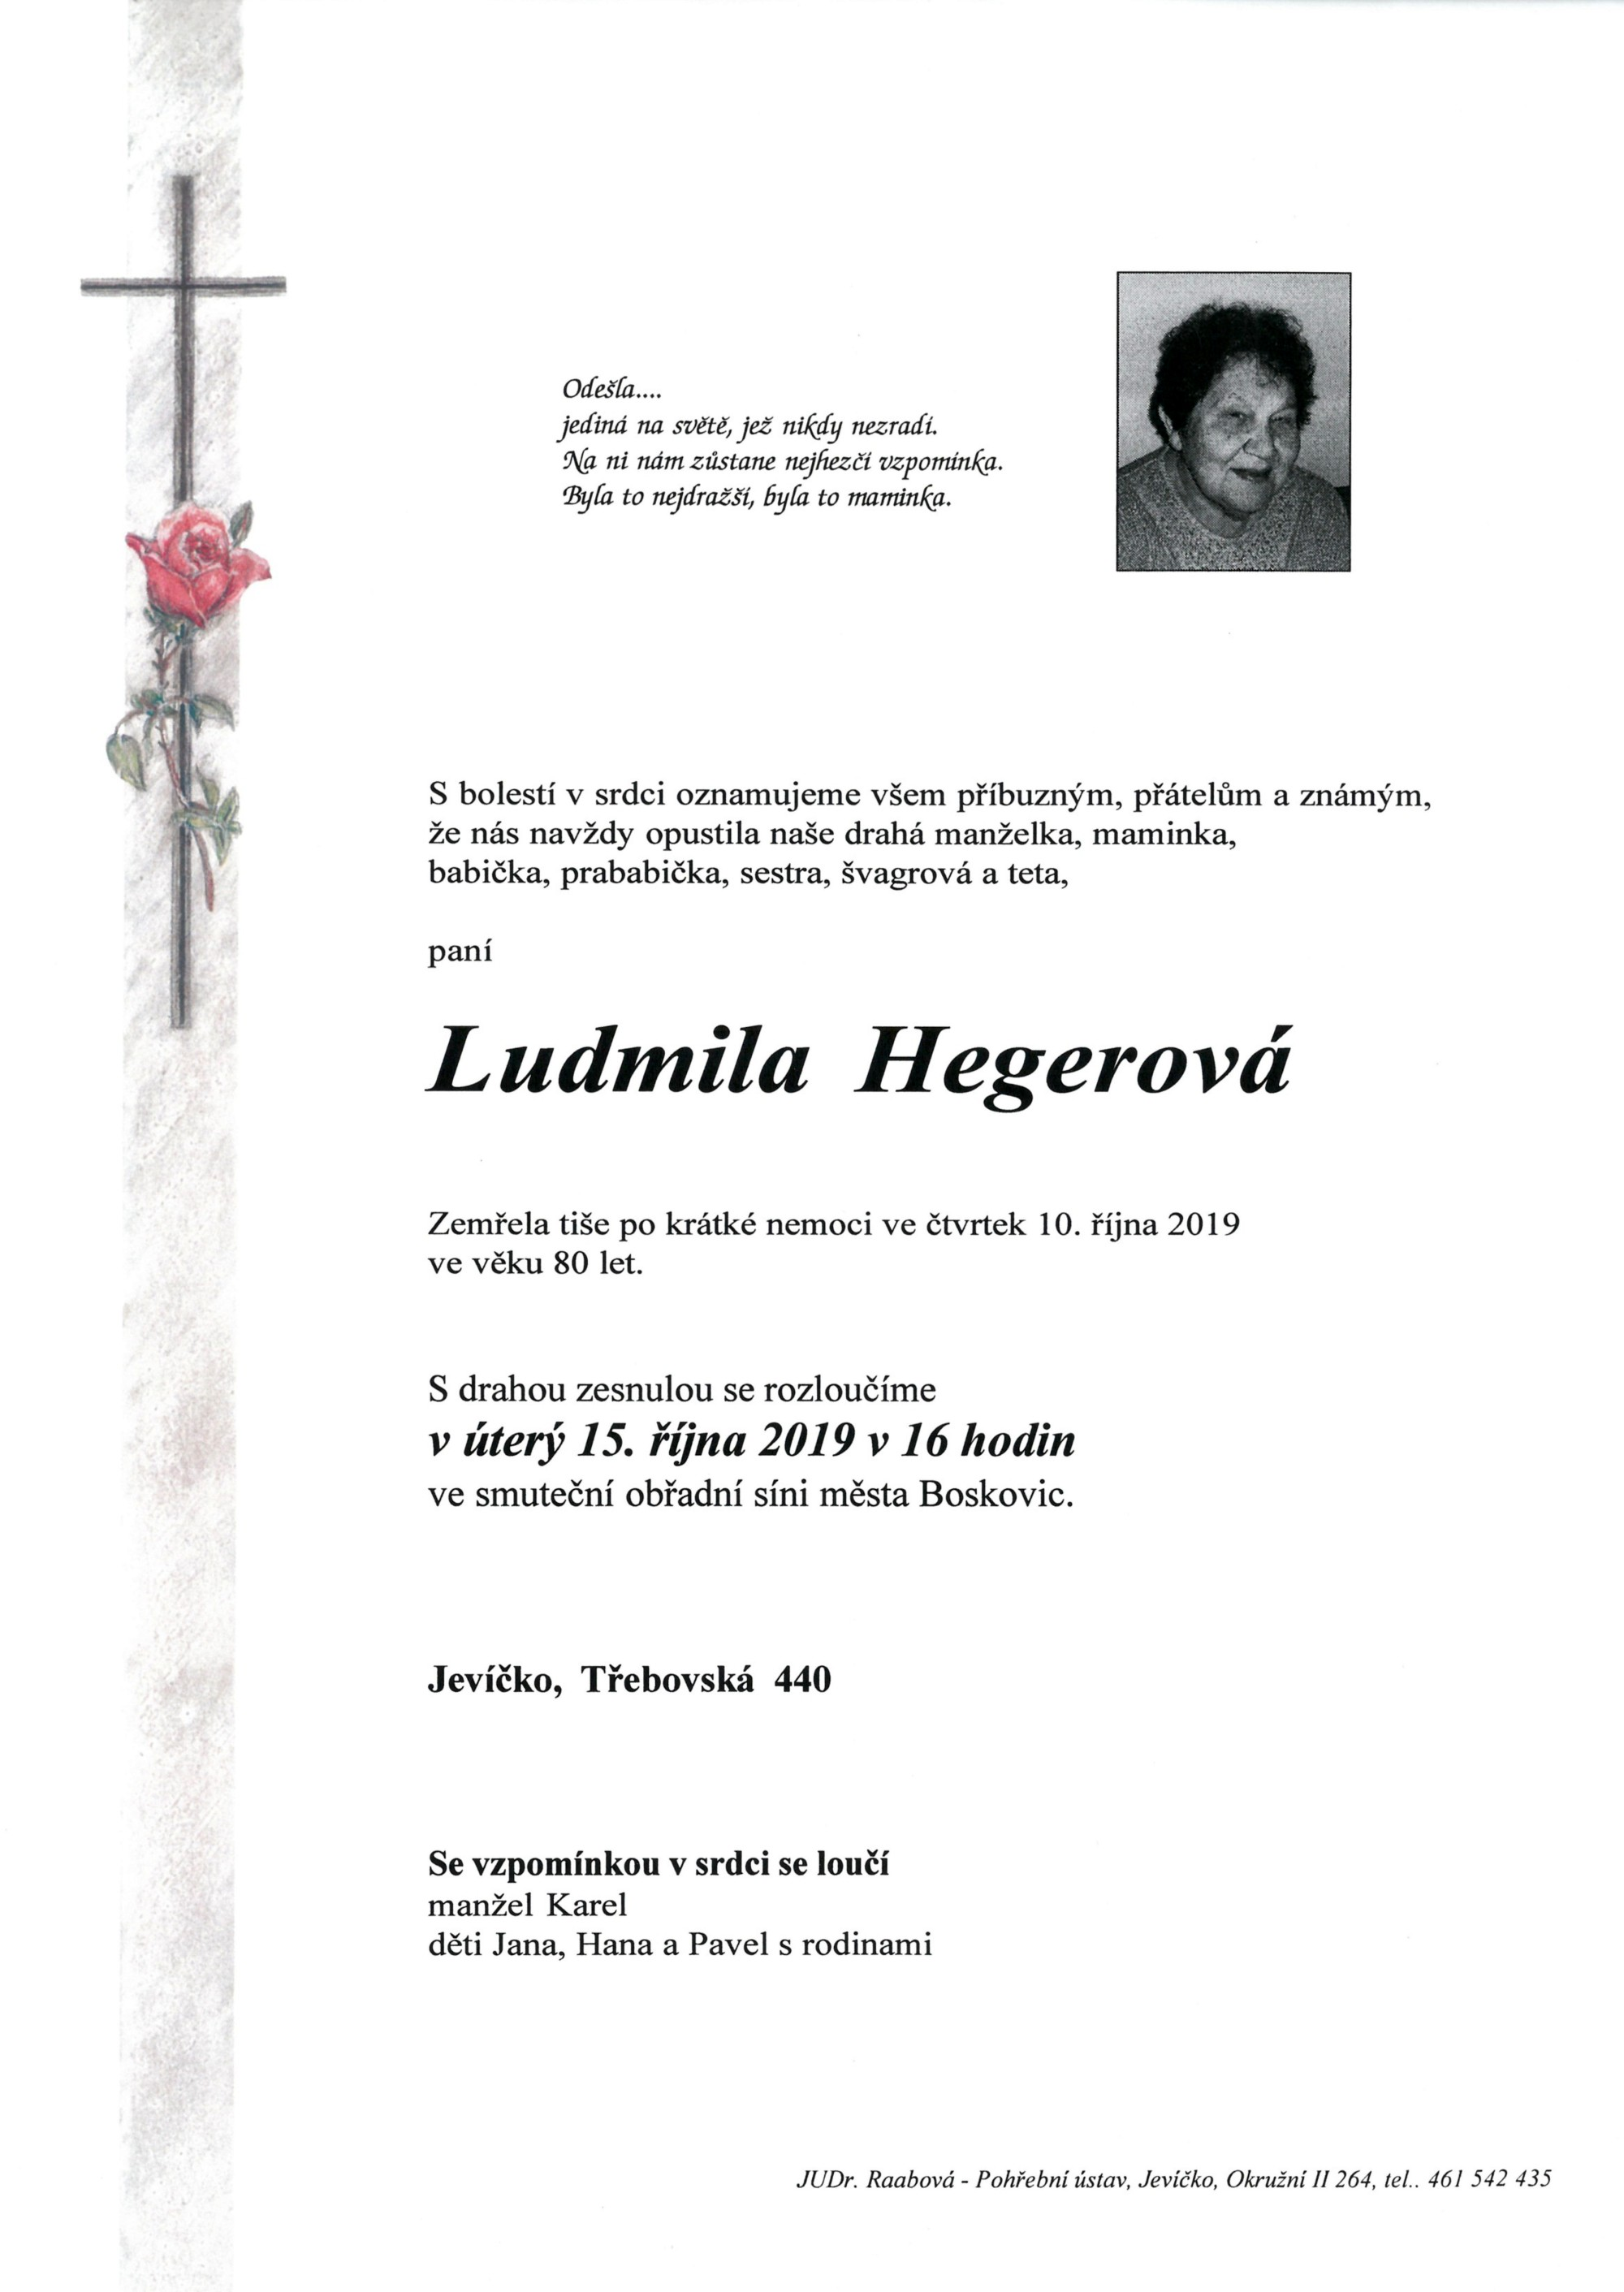 Ludmila Hegerová